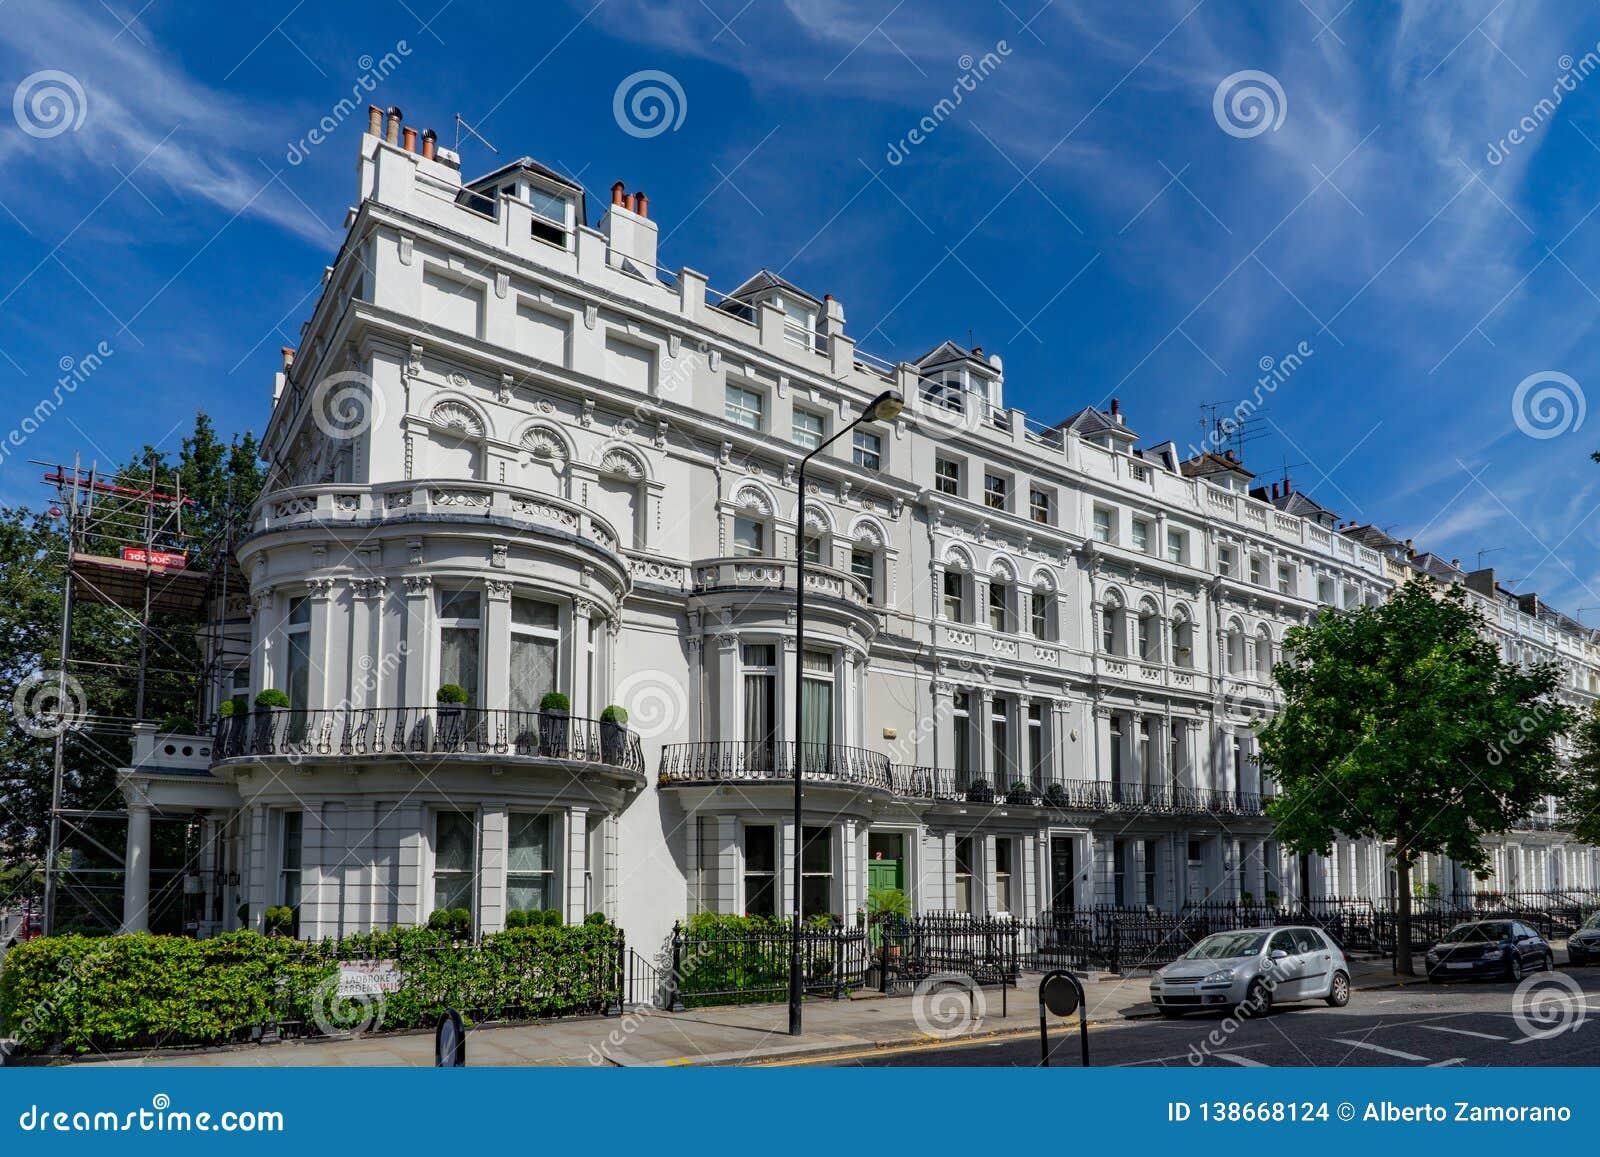 Notting hill houses on neighborhood in London, England, UK